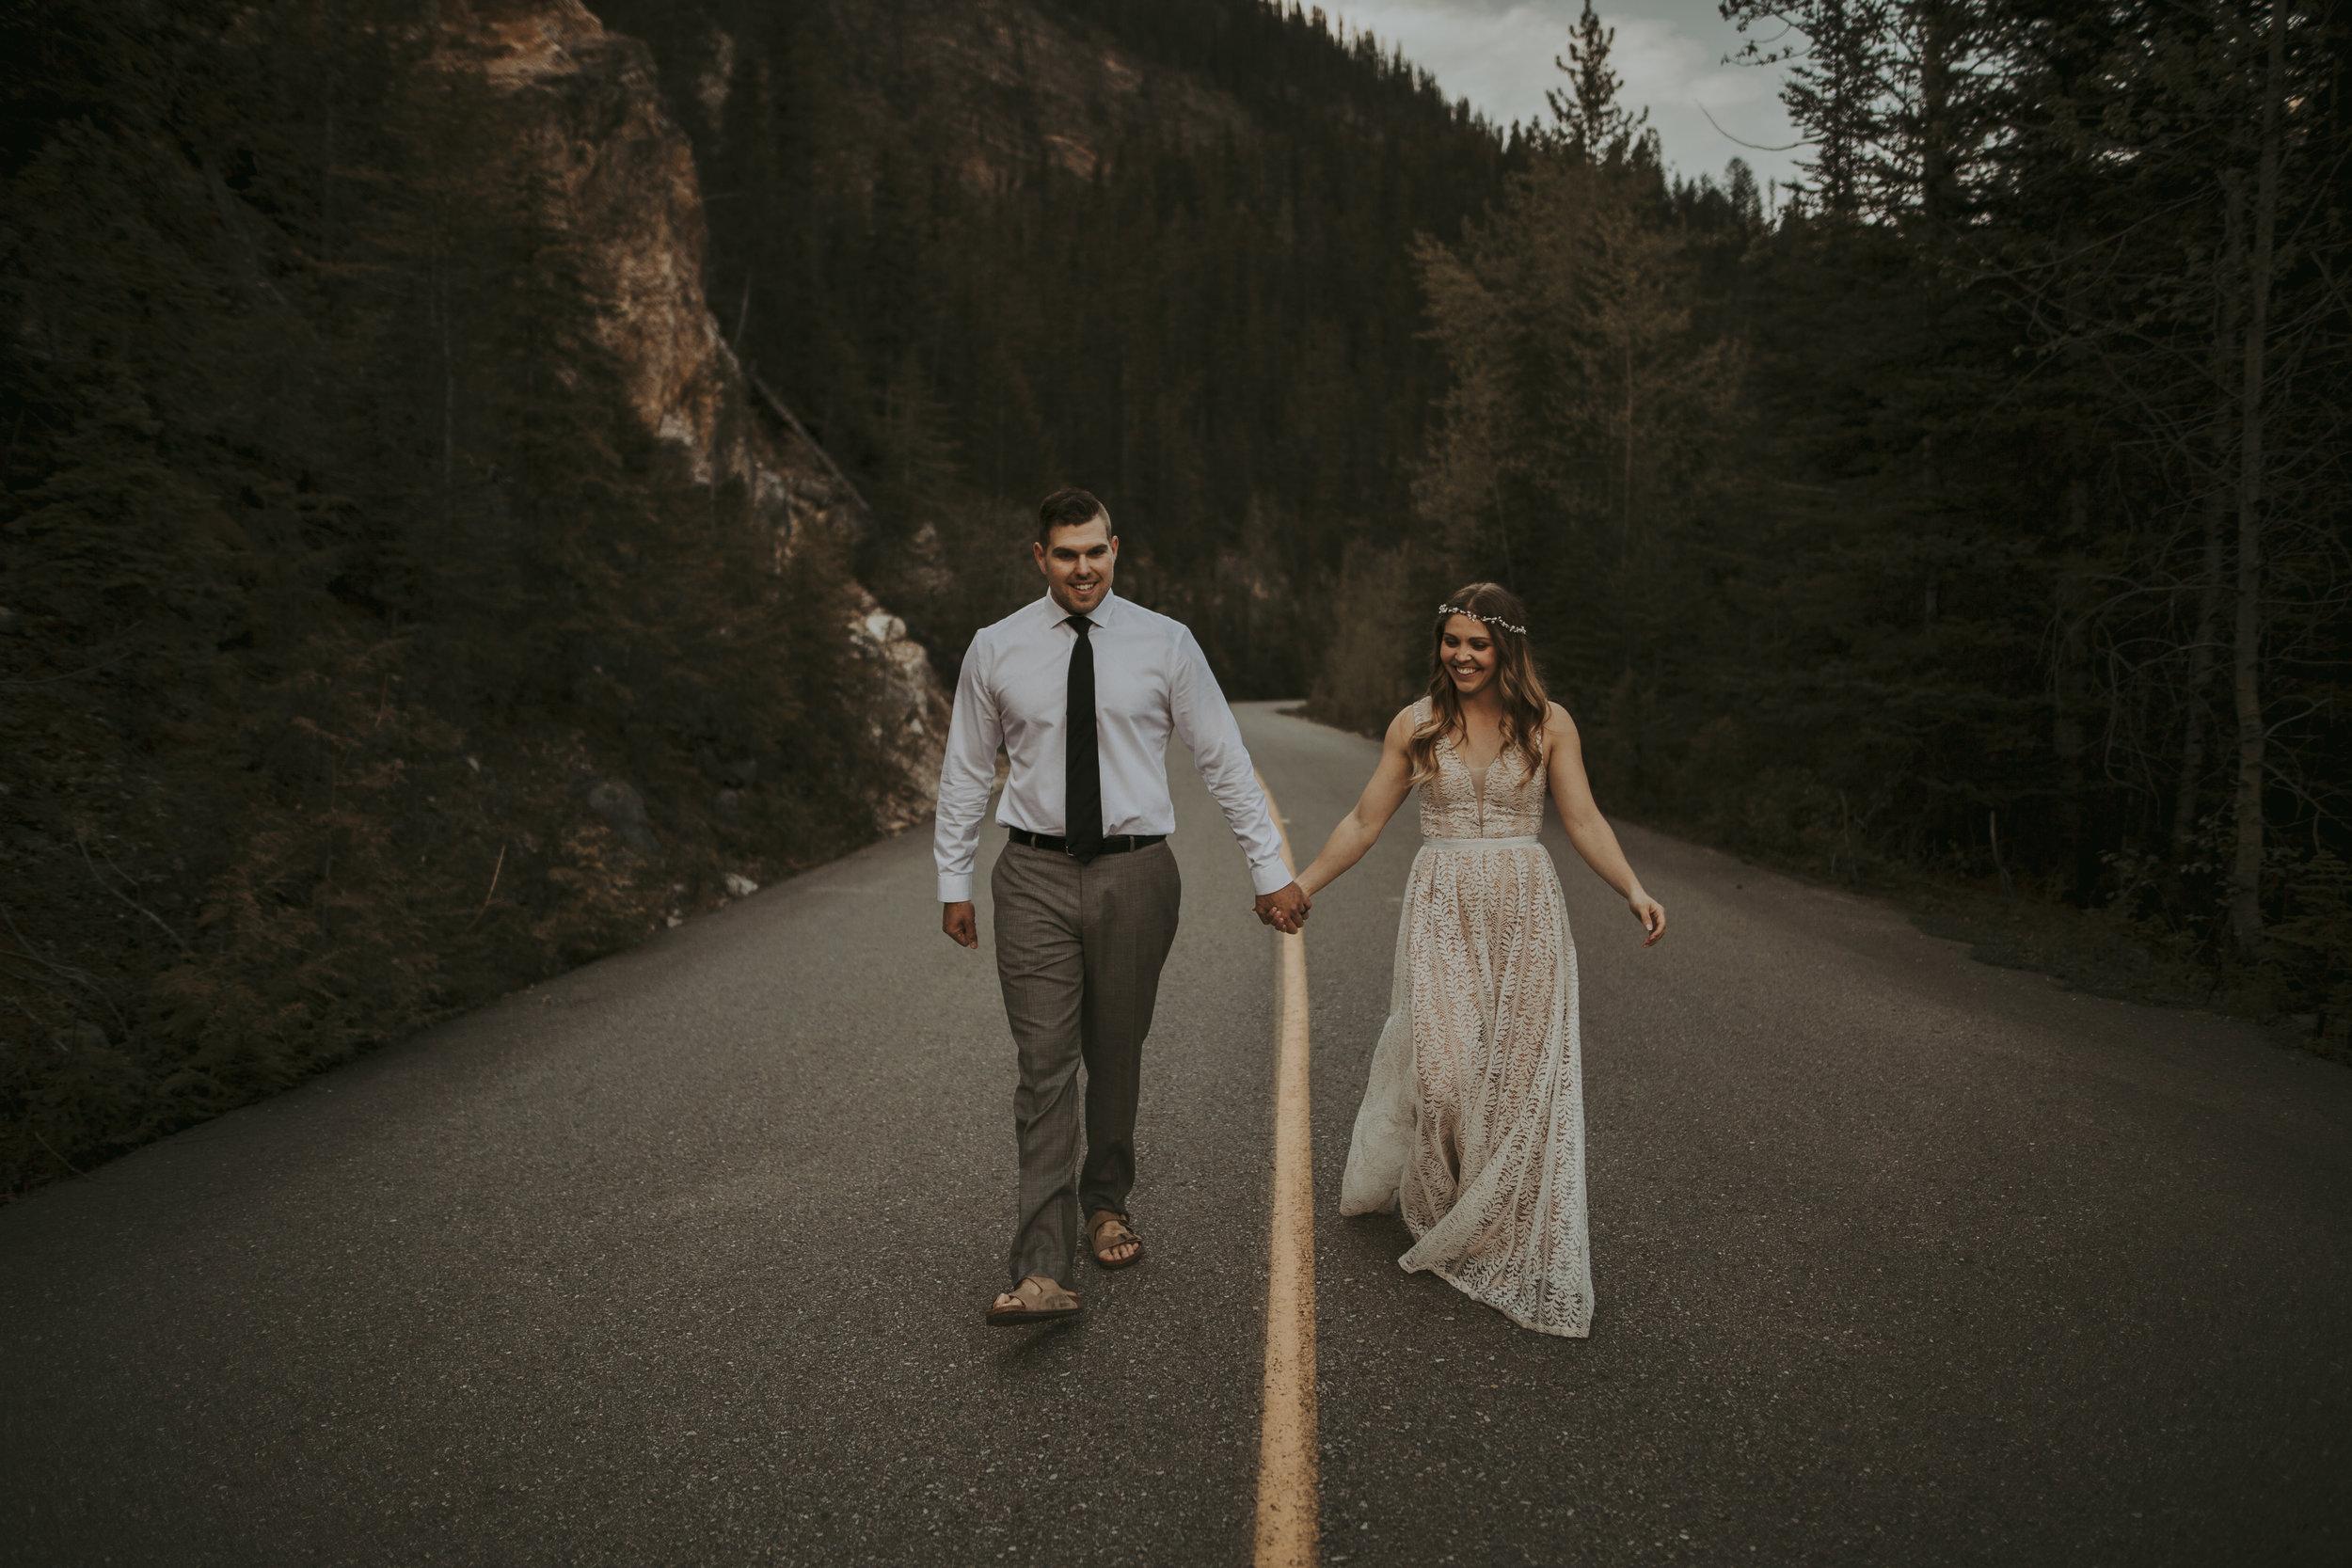 Banff Elopement Photographer - Ayla Love Photography-3.jpg